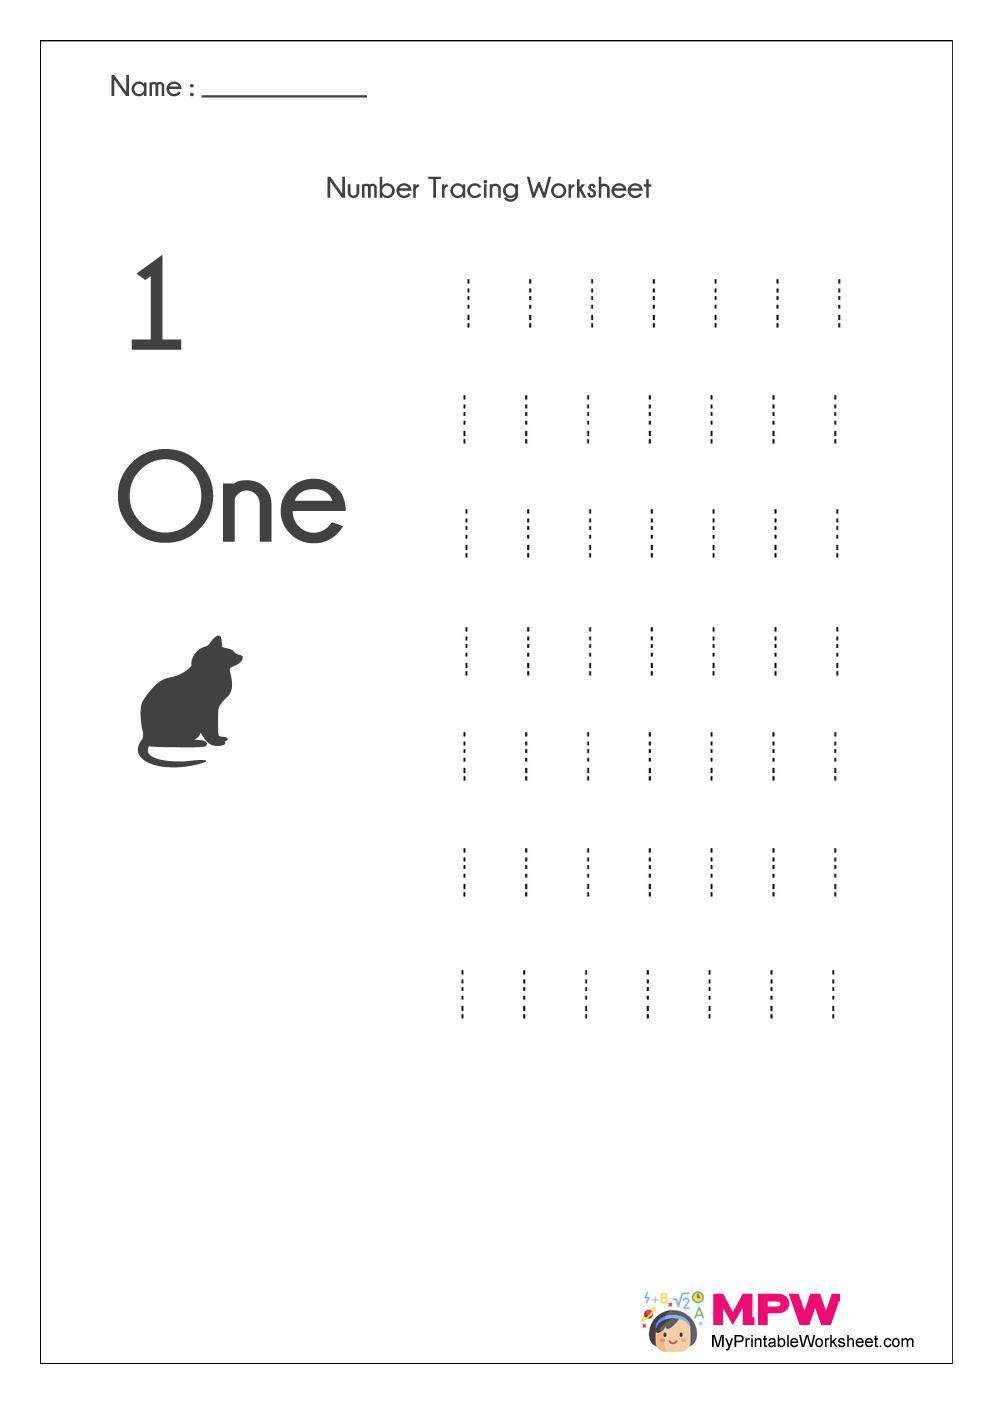 Number Tracing Worksheets 1 20 Dotted Line Number Tracing 1 10 Tracing Worksheets Number Tracing Tracing Worksheets Preschool [ 1403 x 992 Pixel ]